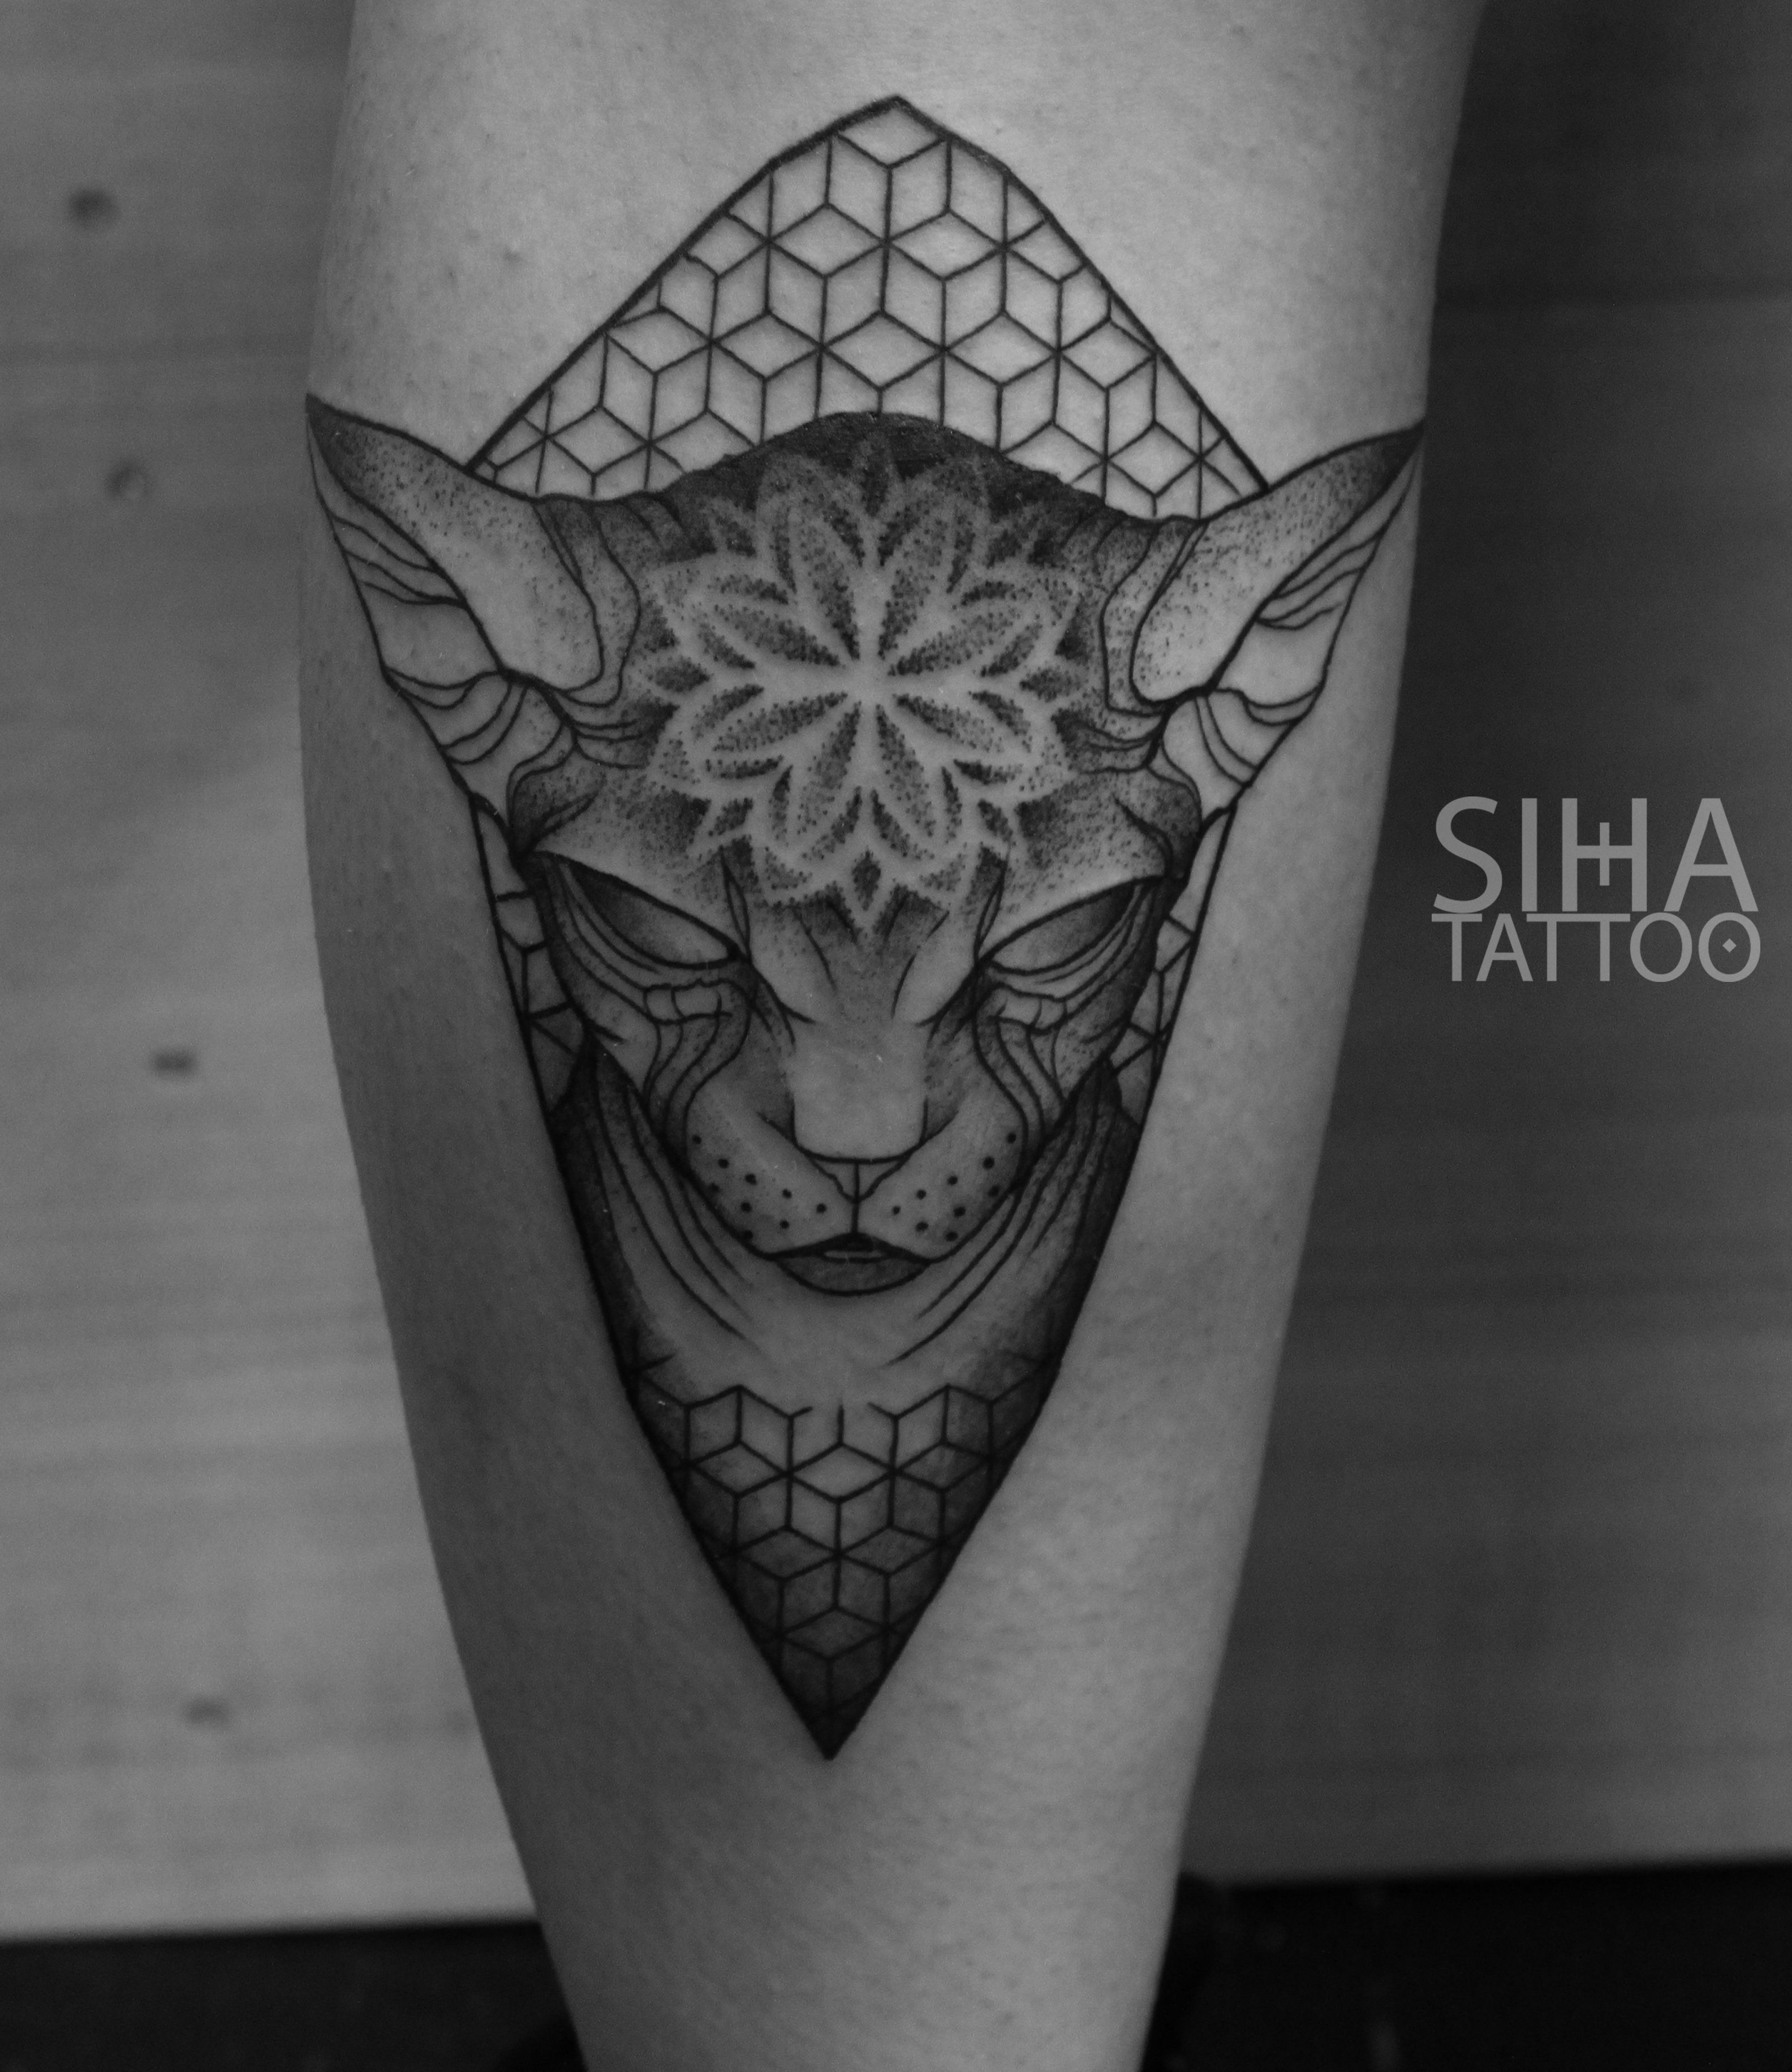 Sphinx Cat Mandala Geometry Dot Work By Jota At Siha Tattoo